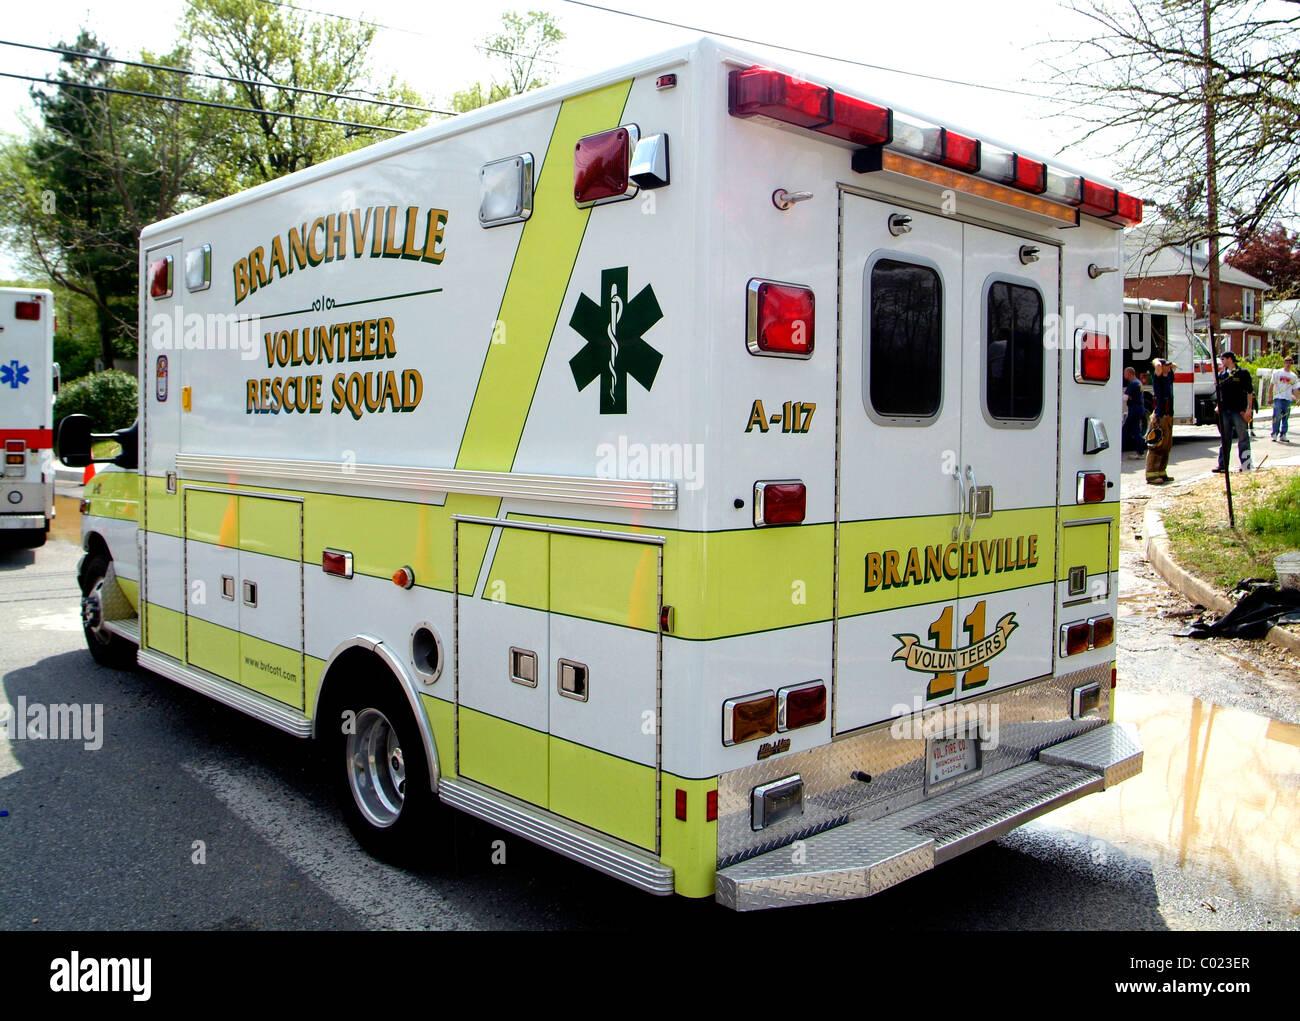 Branchville Vol Fire Dept ambulance - Stock Image